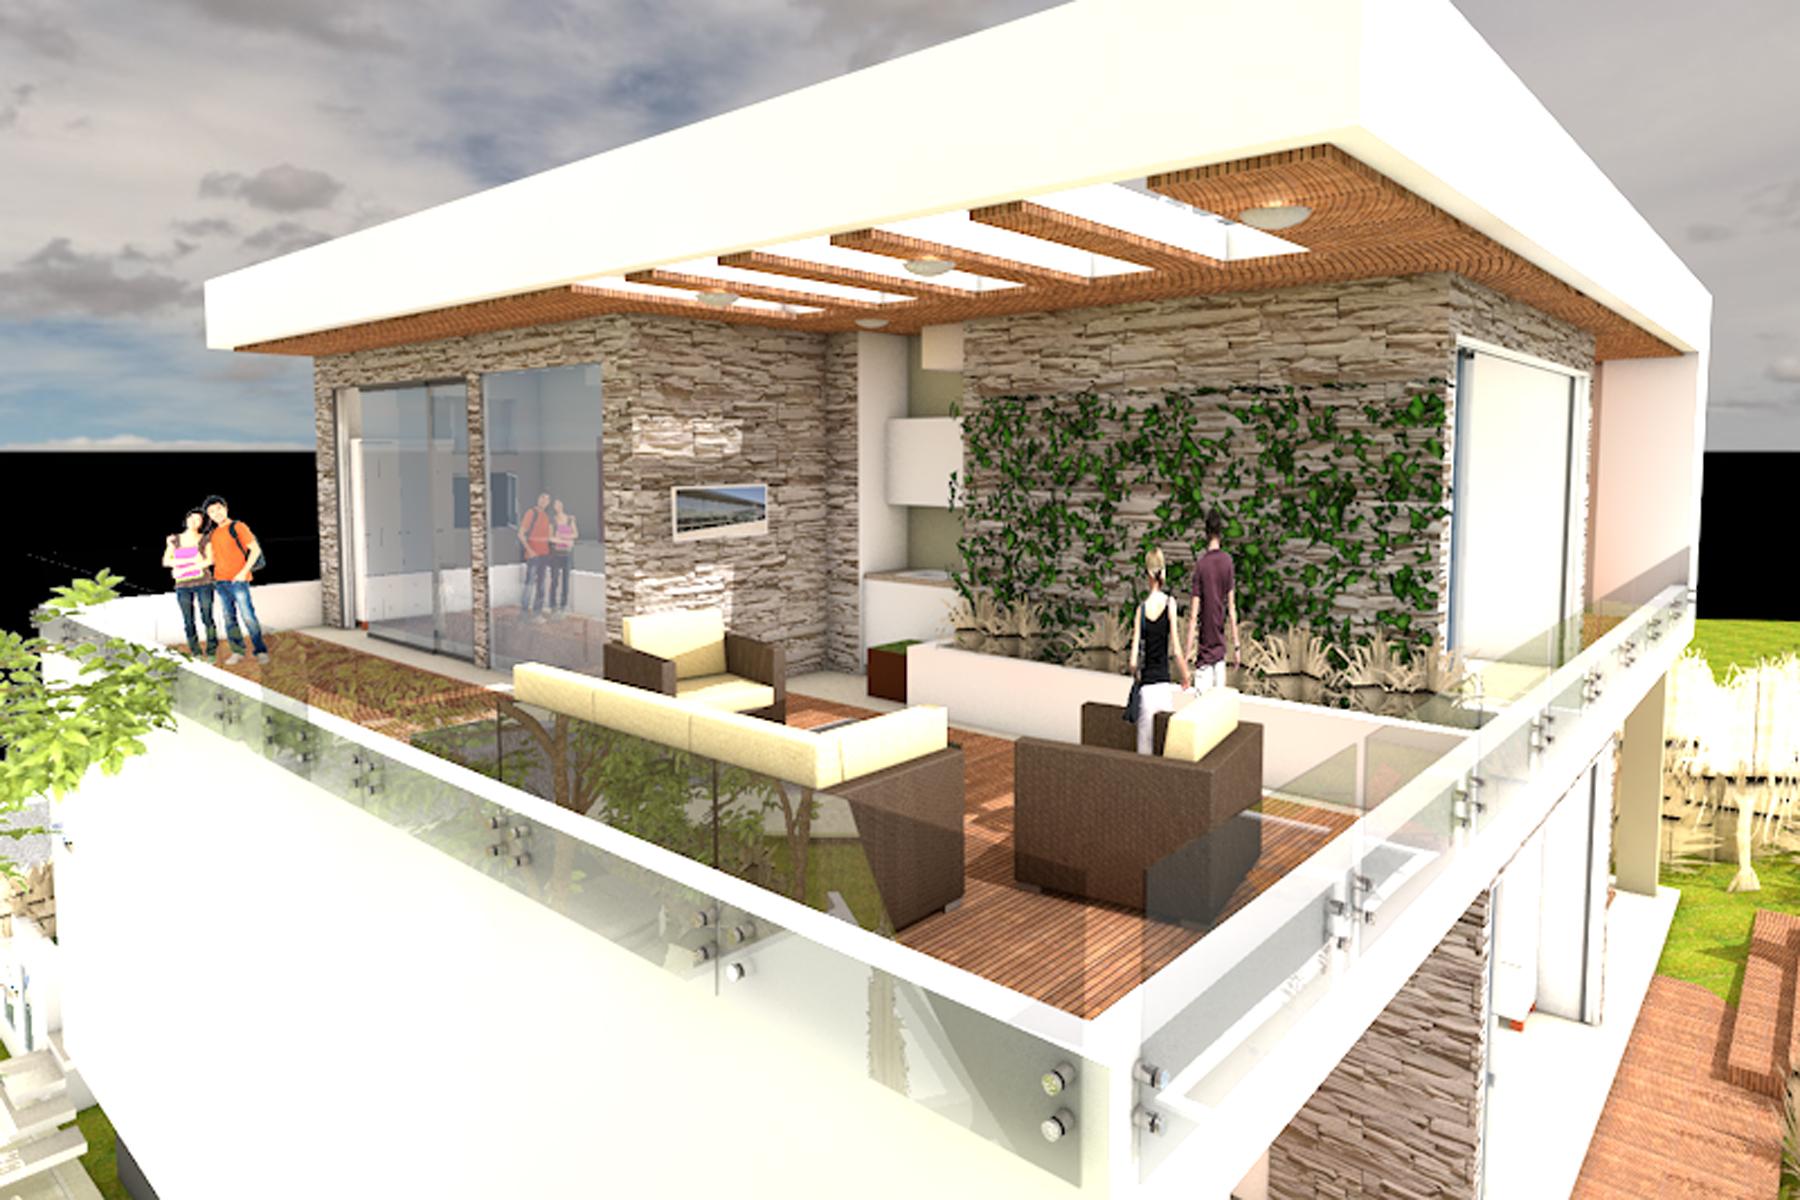 Additional photo for property listing at Paseo de Playa 阿鲁巴其他地方, 阿鲁巴岛上的城市 阿鲁巴岛